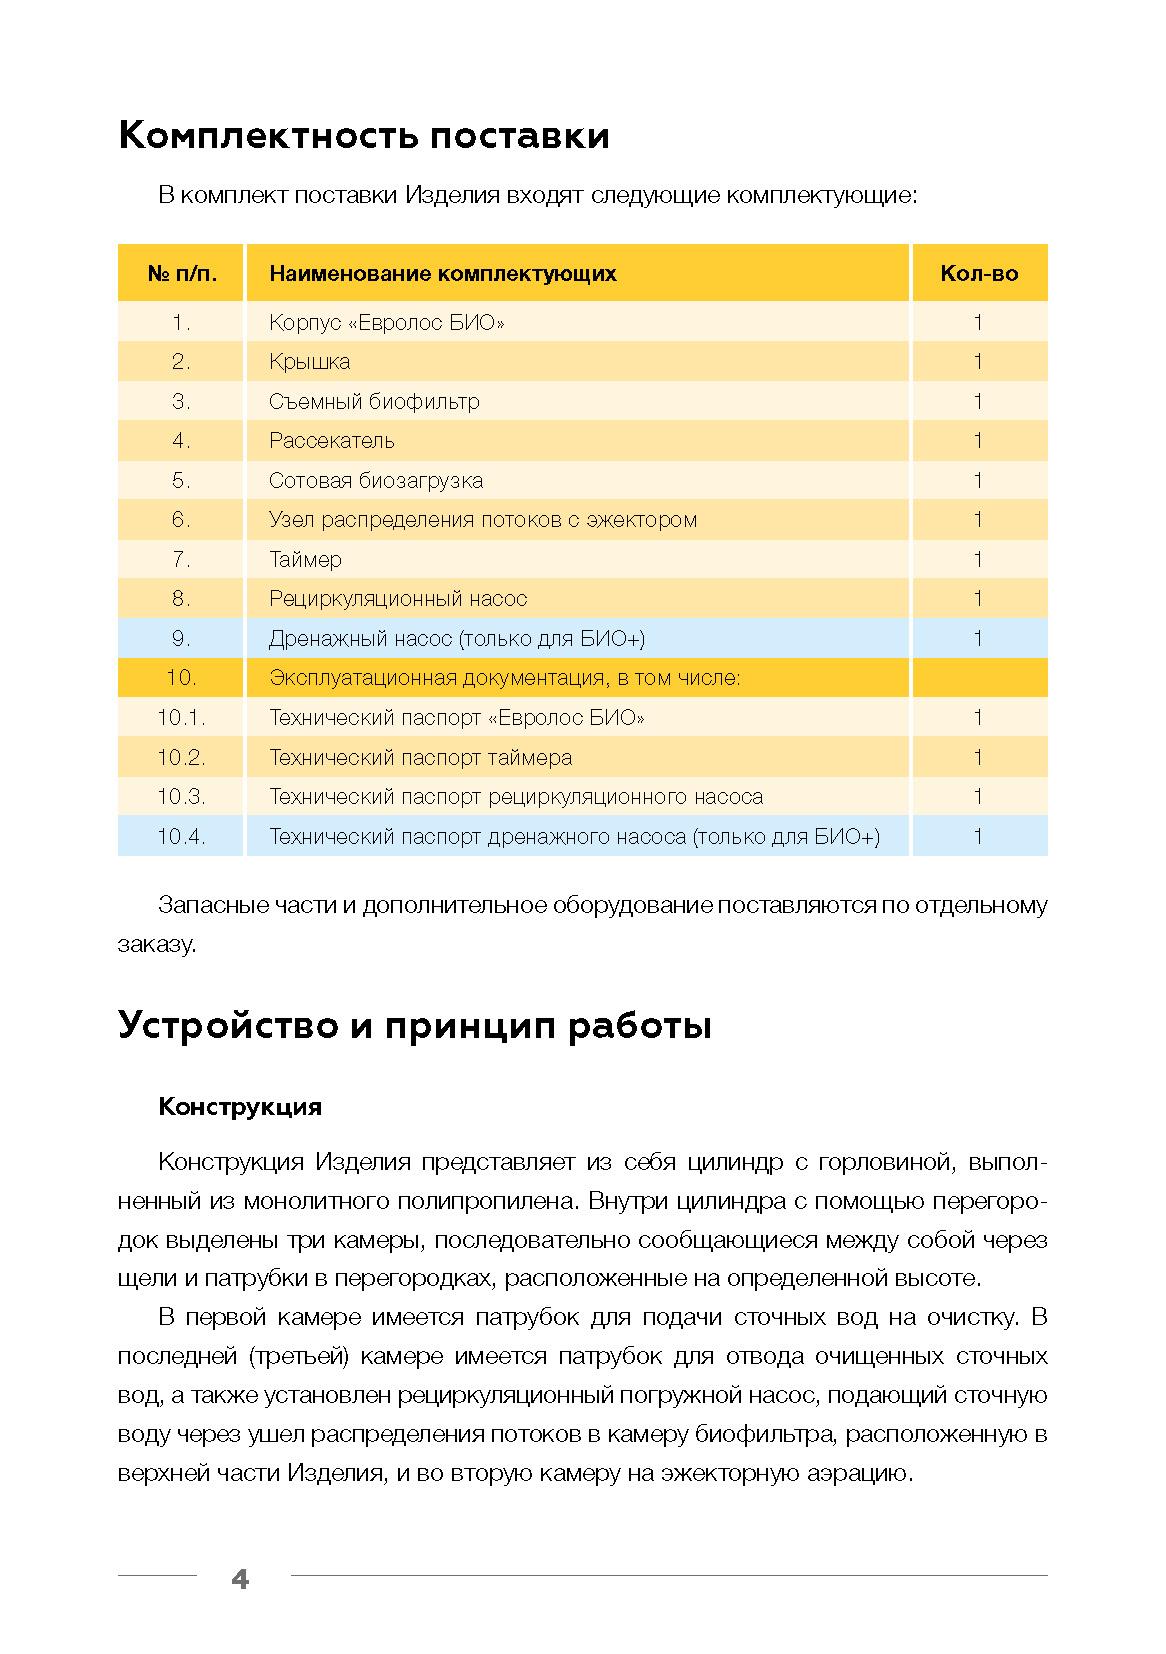 Технический паспорт Евролос Био_Страница_06